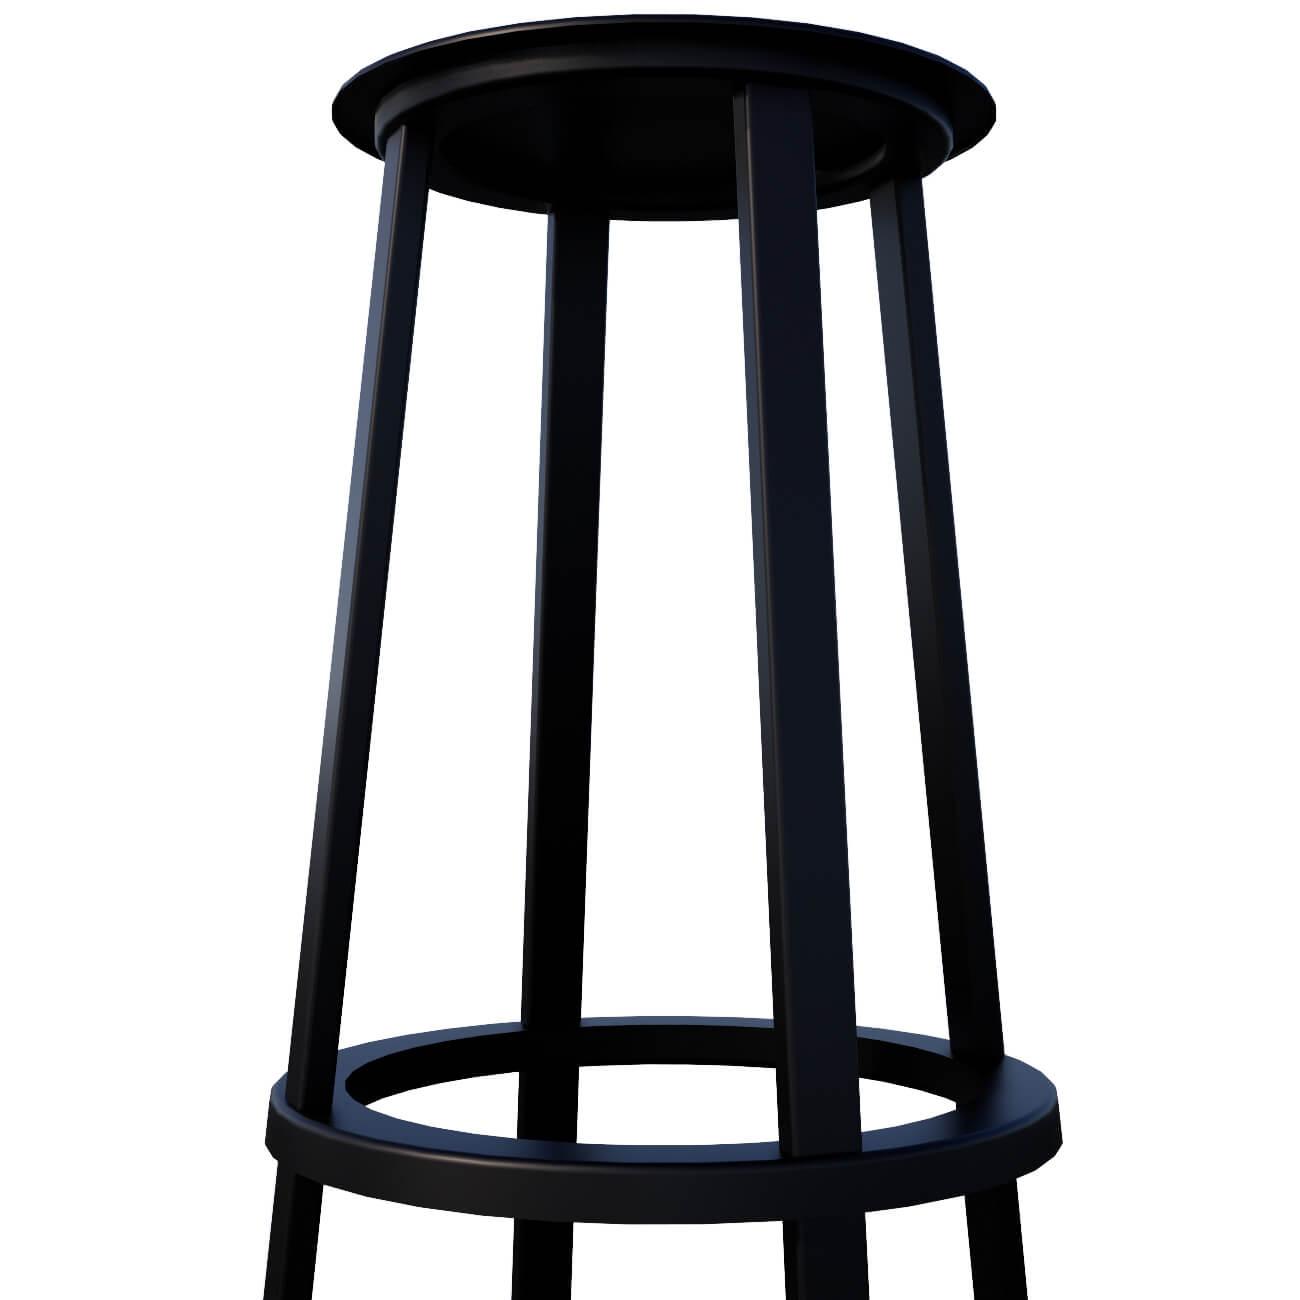 BLACK STOOL - SEAT